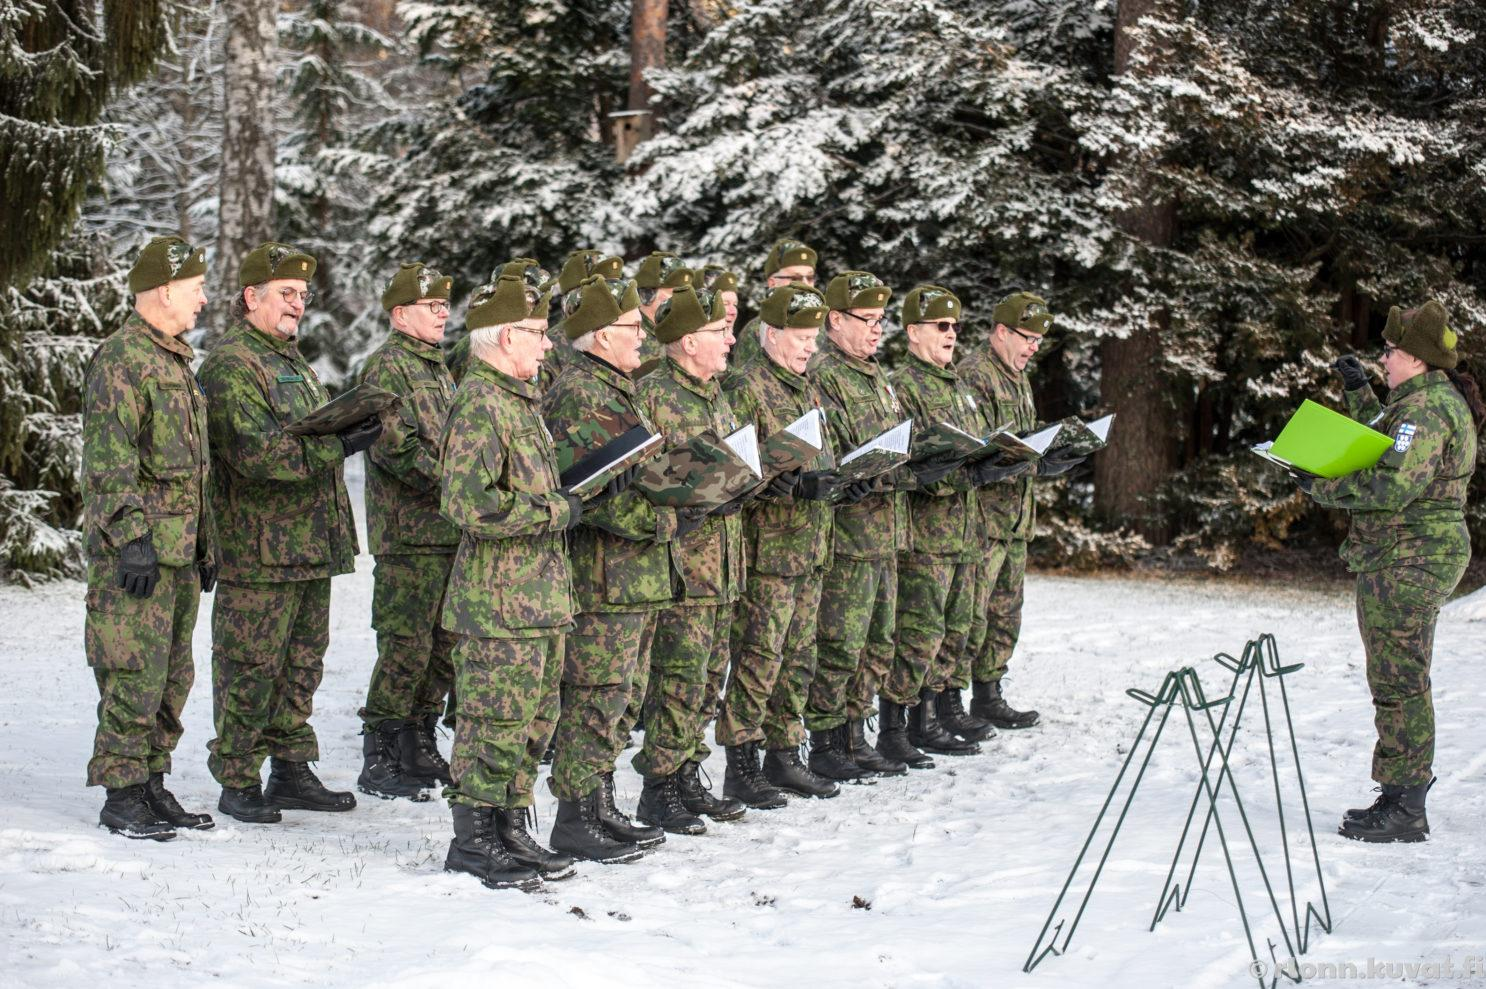 Maanpuolustusjuhla 30.11.2019